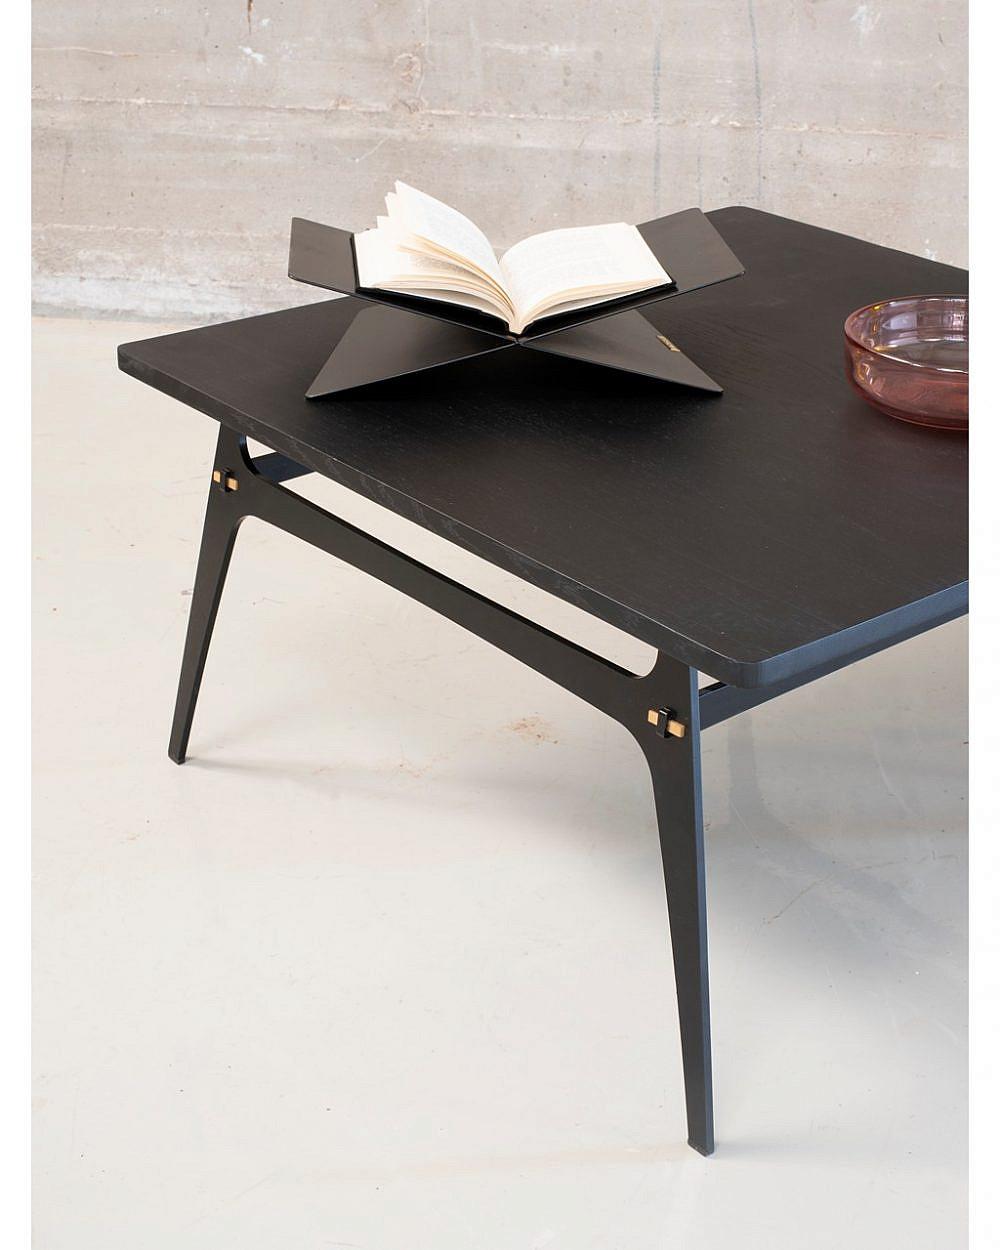 "TRIZ שולחן קפה. 6,500 ש""ח. להשיג באתר סטודיו NACHSHON | צילום: סטודיו נחשון"